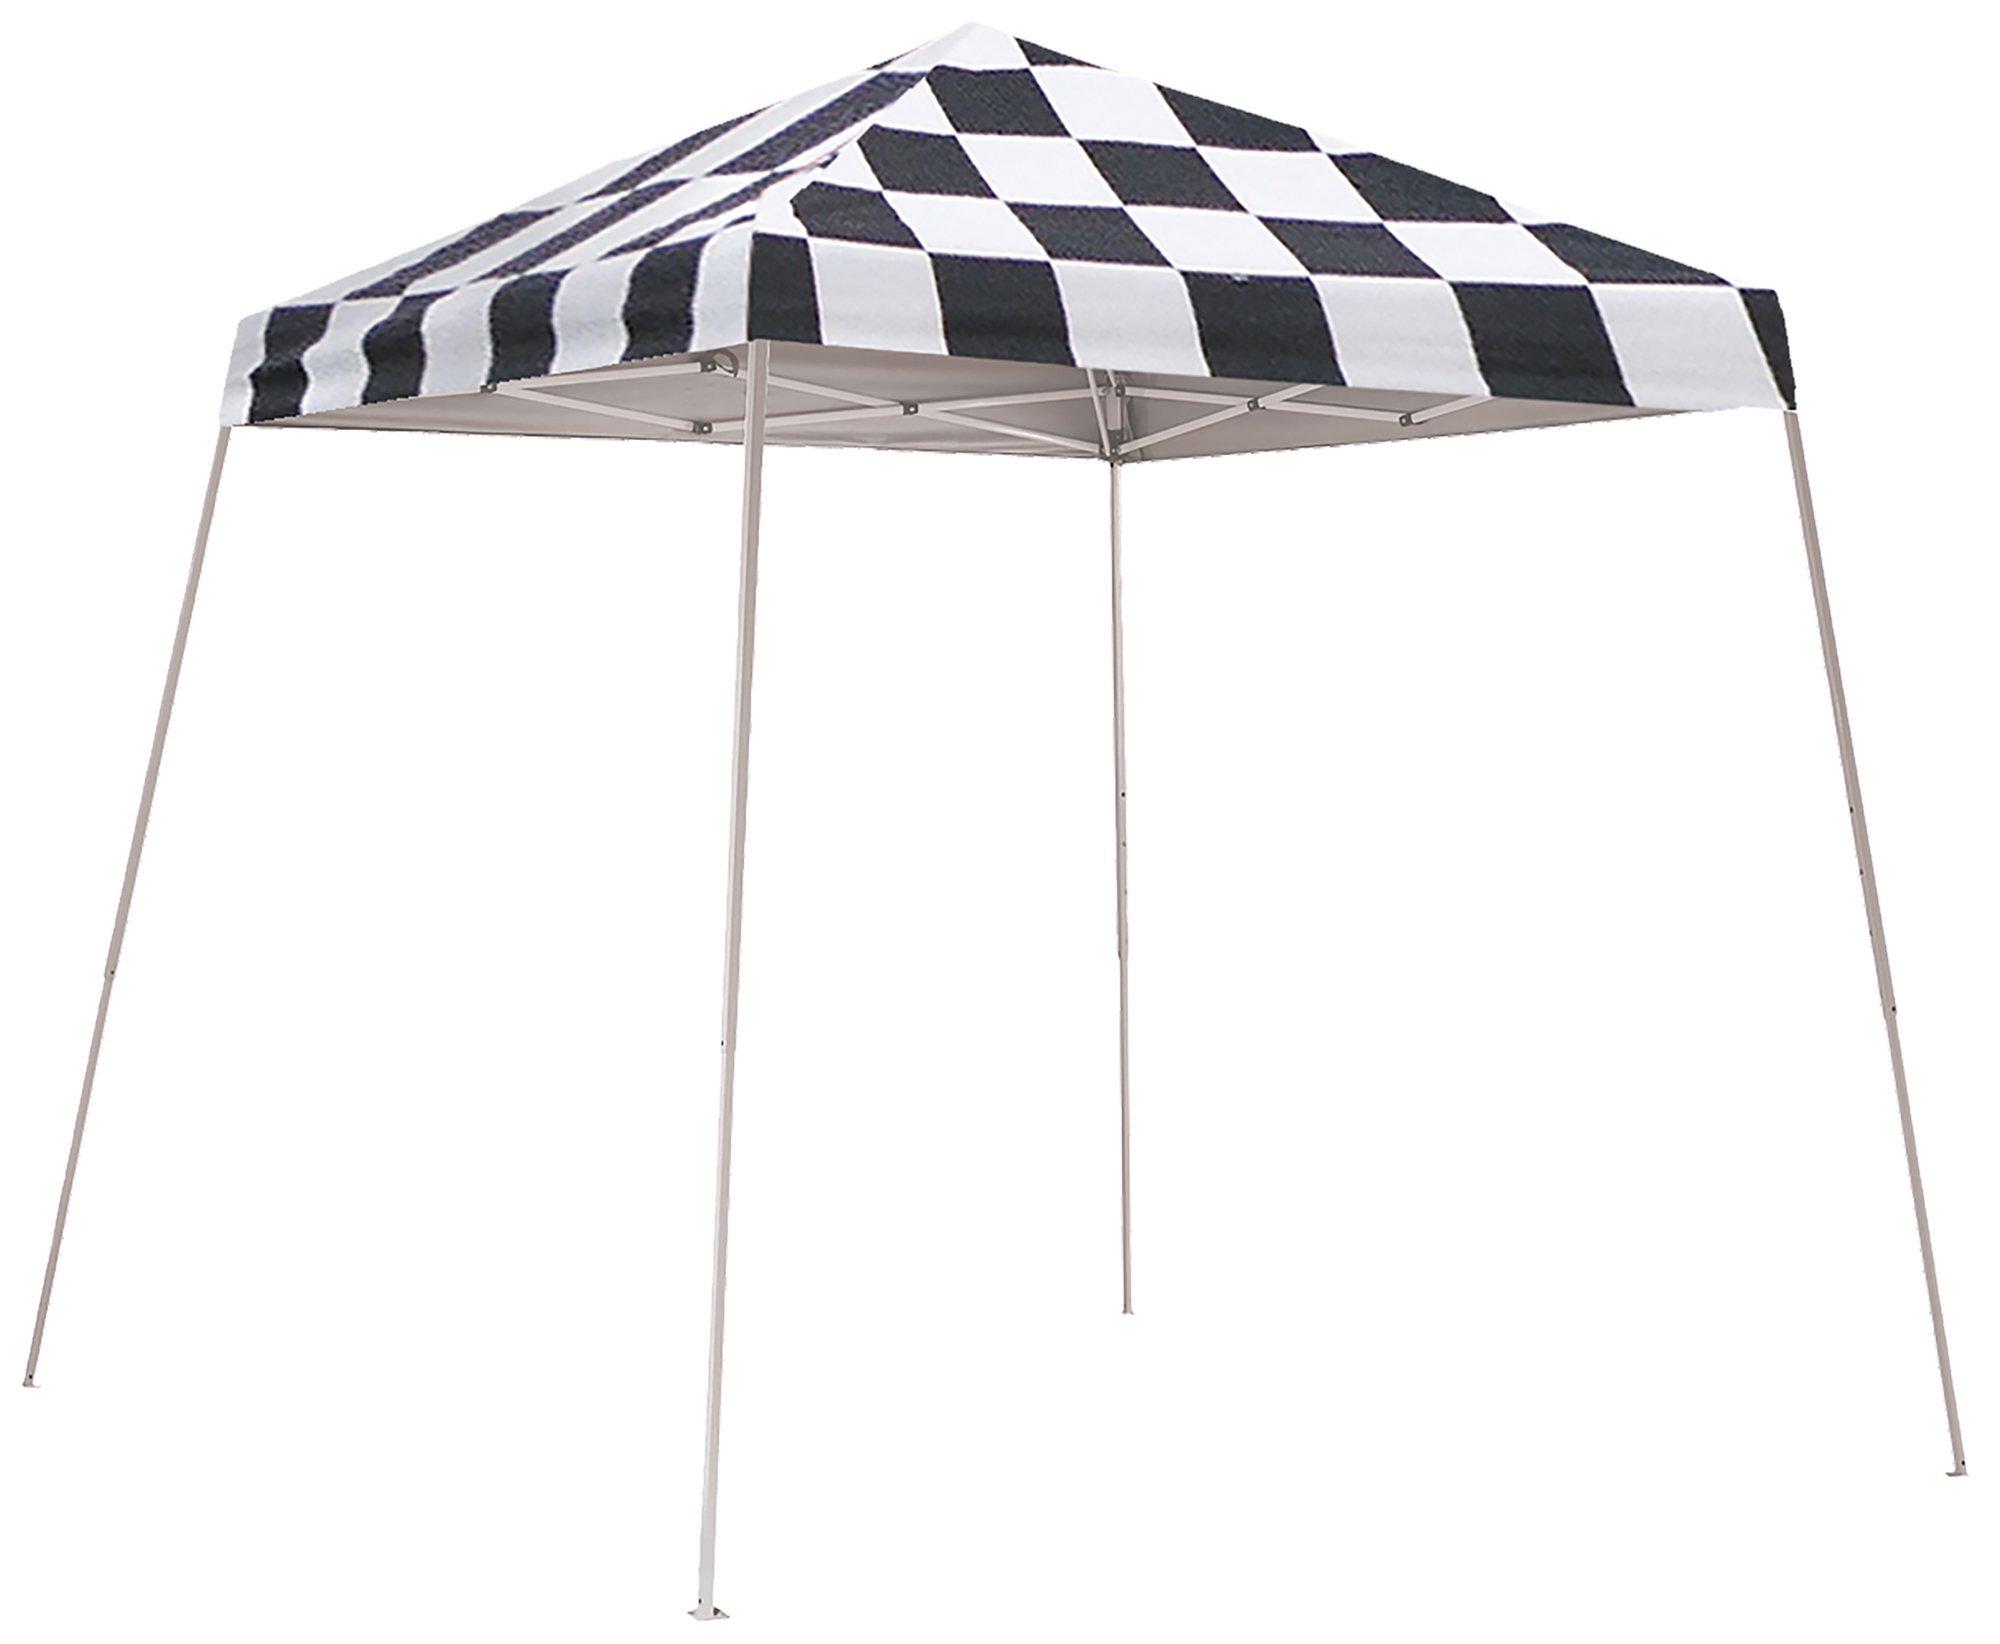 ShelterLogic Slant Leg Pop-Up Canopy with Carry Bag, Checkered Flag, 8 x 8 ft.